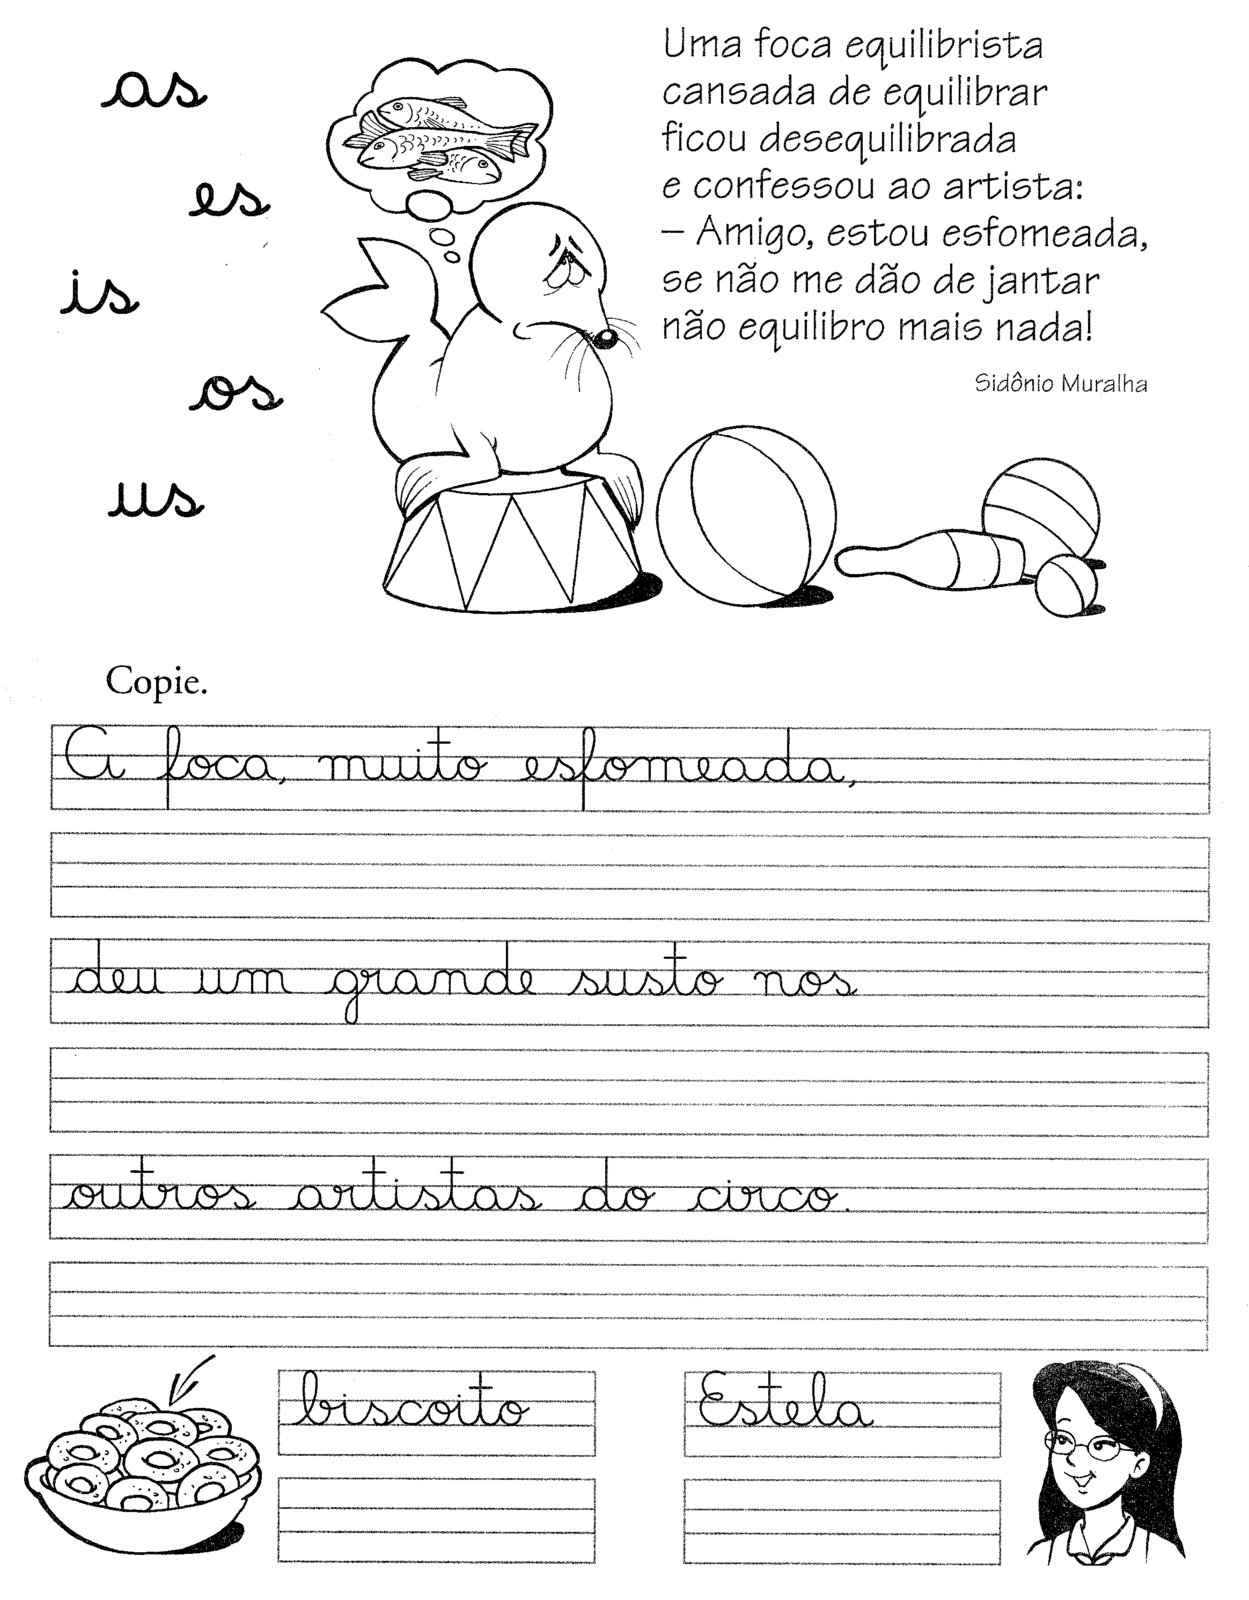 Madrid Para Educa Infantil Letras Mai Sculo Min Para Imprimir